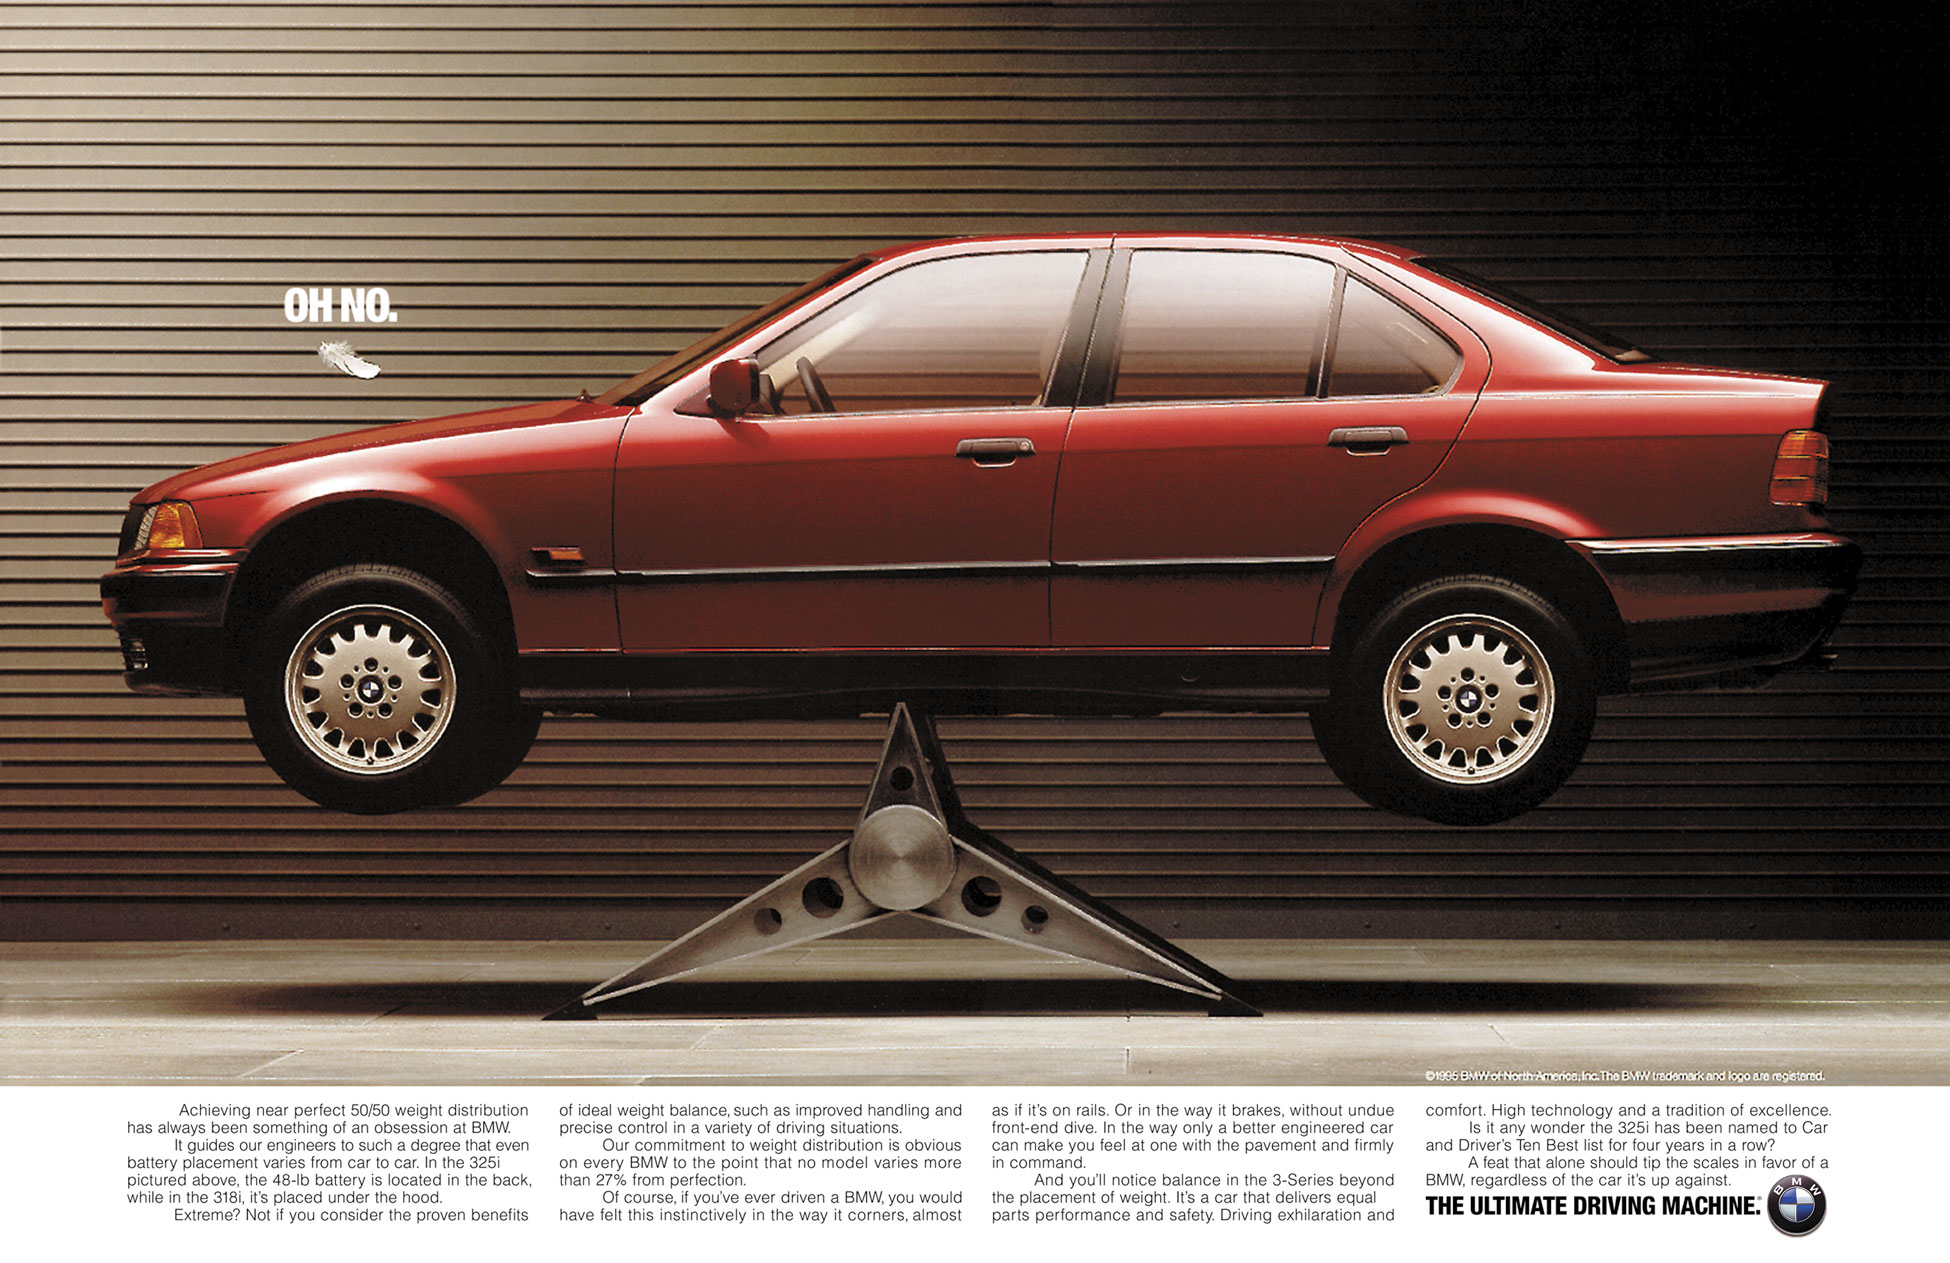 BMW 3-Series Brand Ad